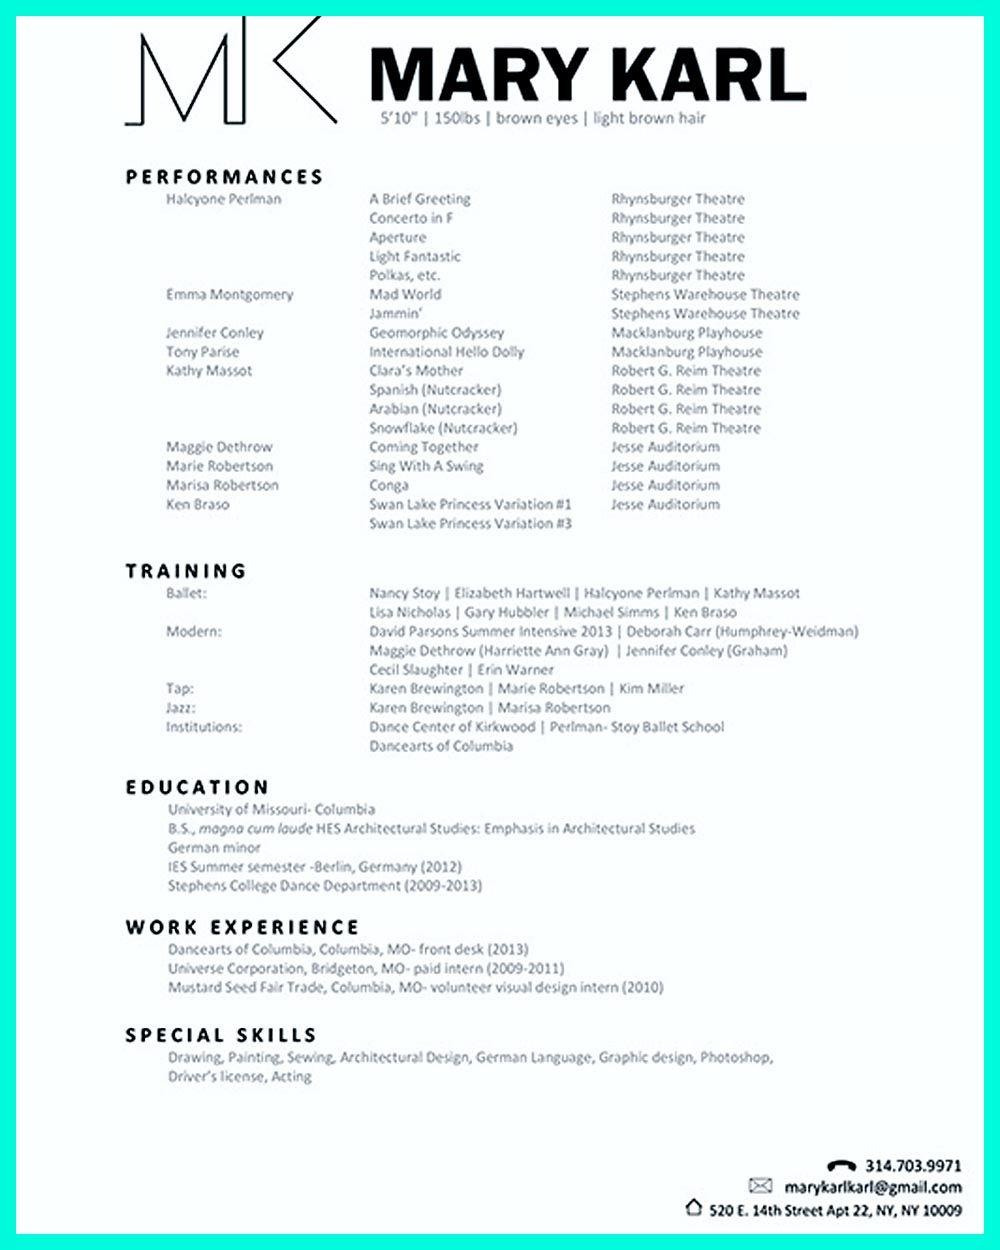 dance audition resume dance audition resume sample dance audition resume template dance audition resume example college dance audition resume dance resume for audition dance resume for college audition resume for dance audition template child dance resume for audition